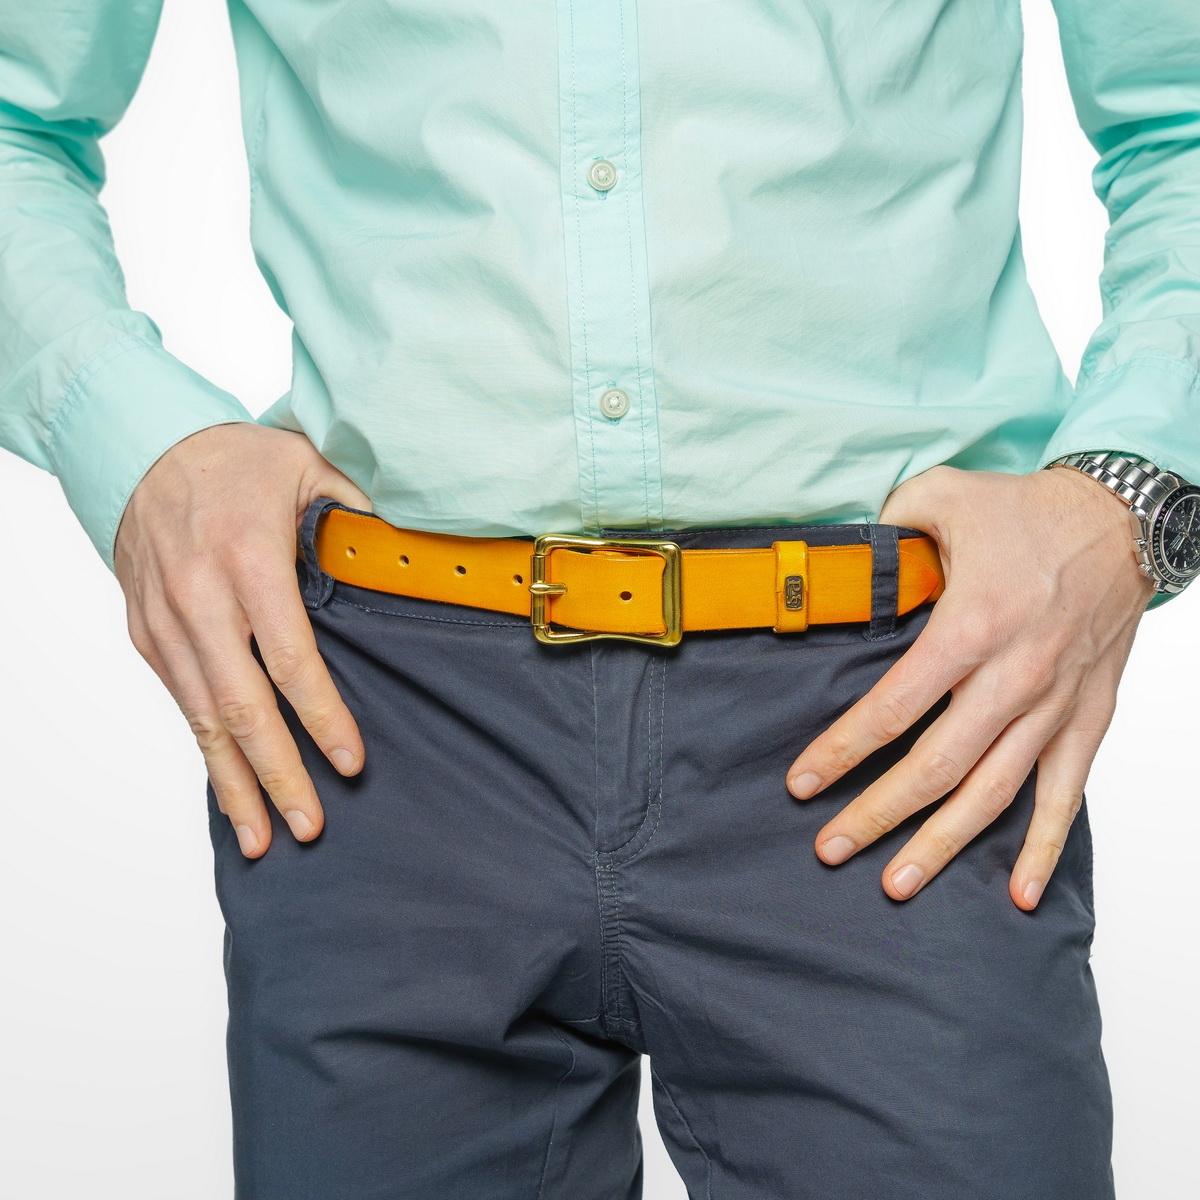 Exquisite belt with roller brass buckle 30mm bright mustard